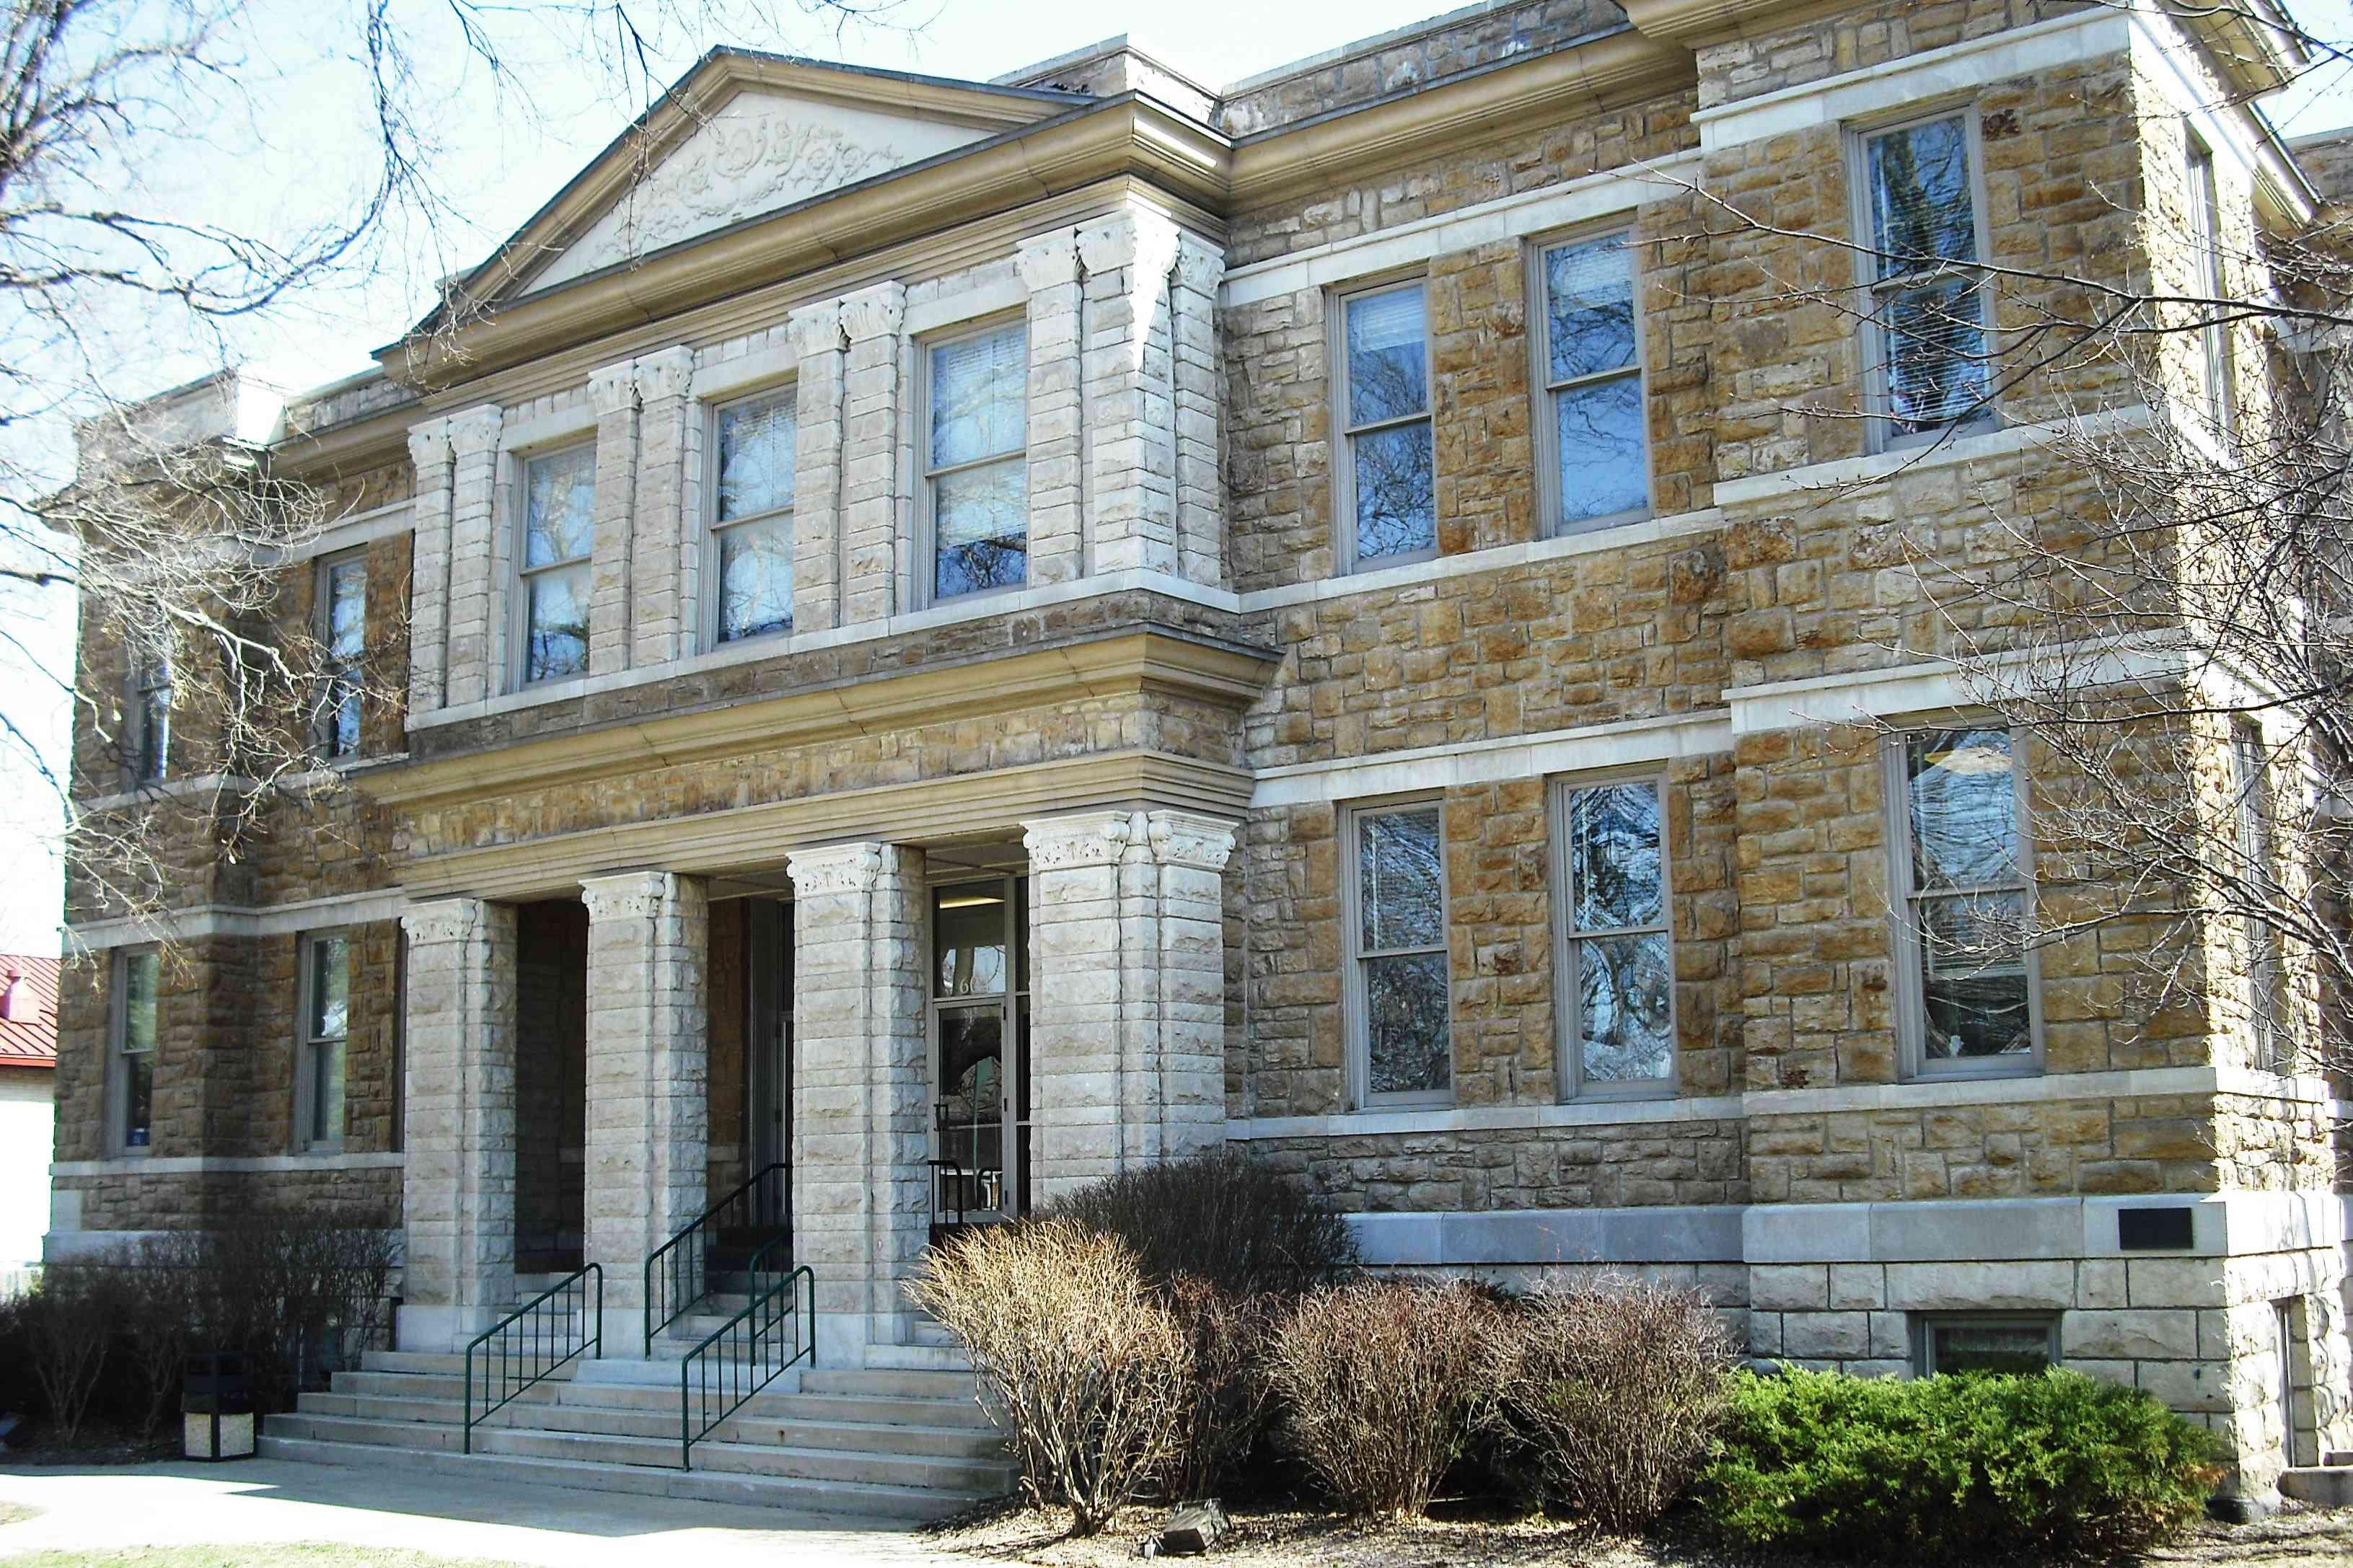 Case Library at Baker University